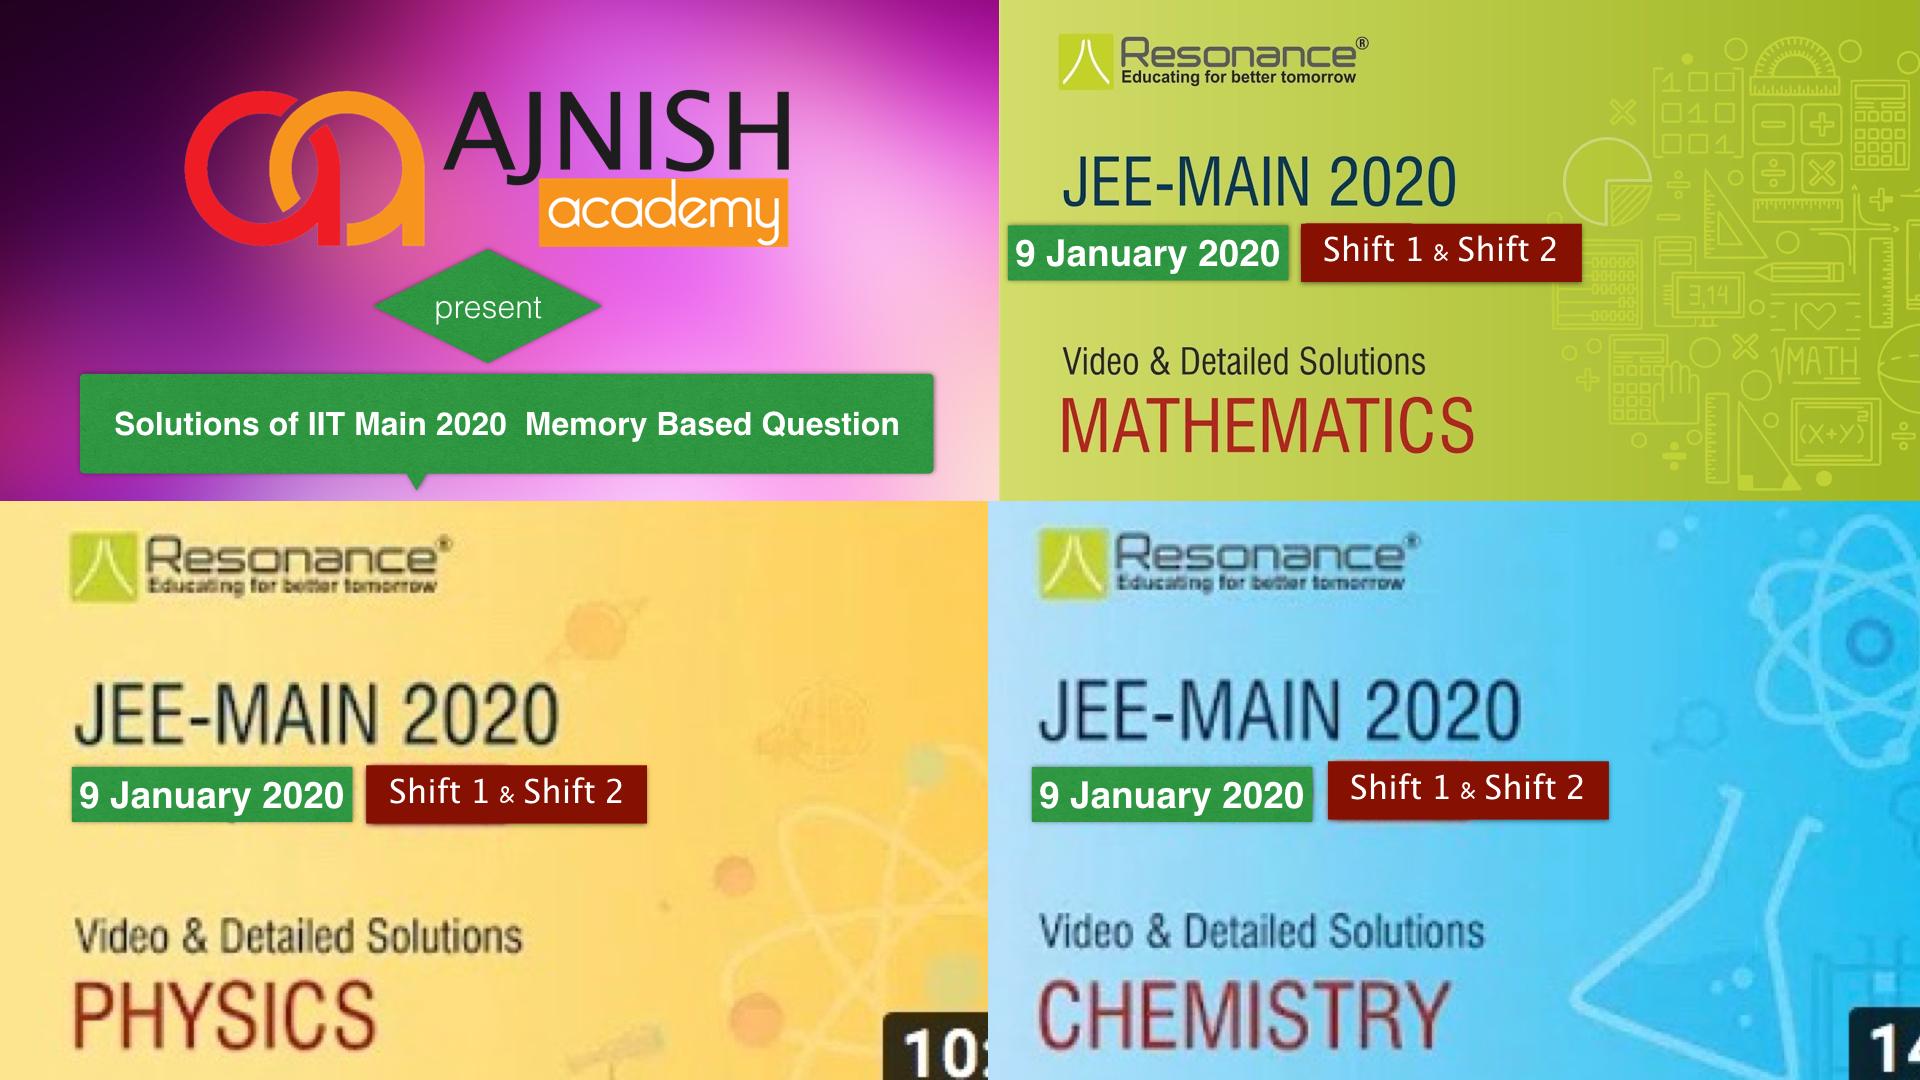 IIT Main 2020 Video Solutions (9 January)